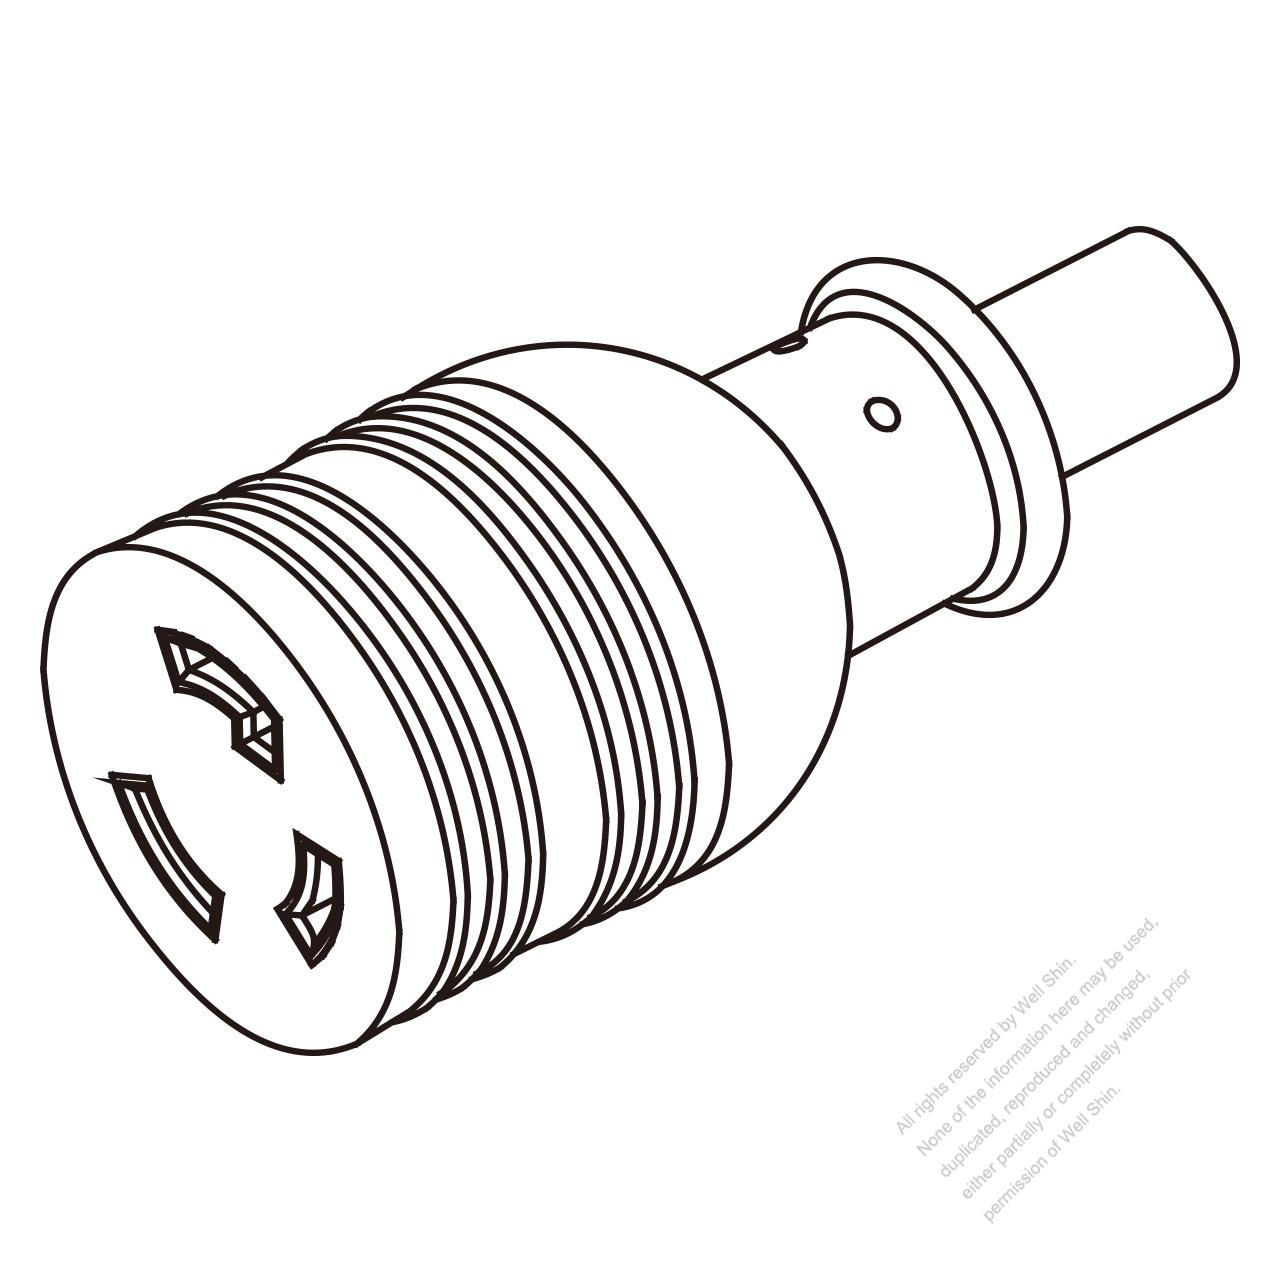 l5 30r wiring diagram database Nema 5 -30 usa canada twist locking l5 30r 2 p 3 wire grounding 30a 125v l5 30r male l5 30r